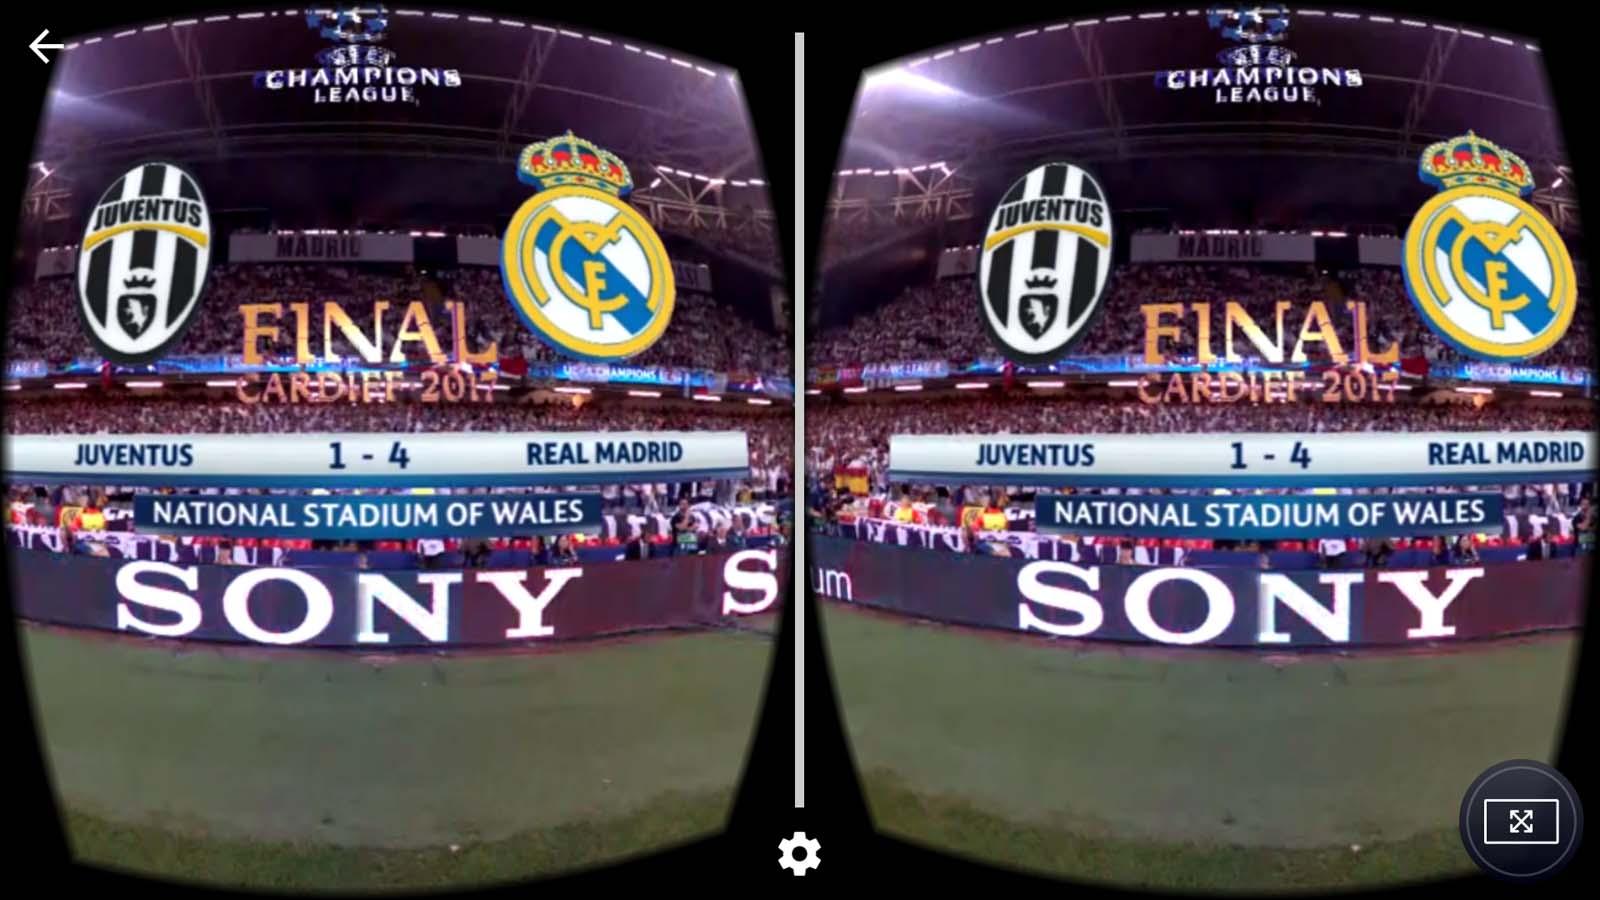 VR headset sport google cardboard football soccer live 360